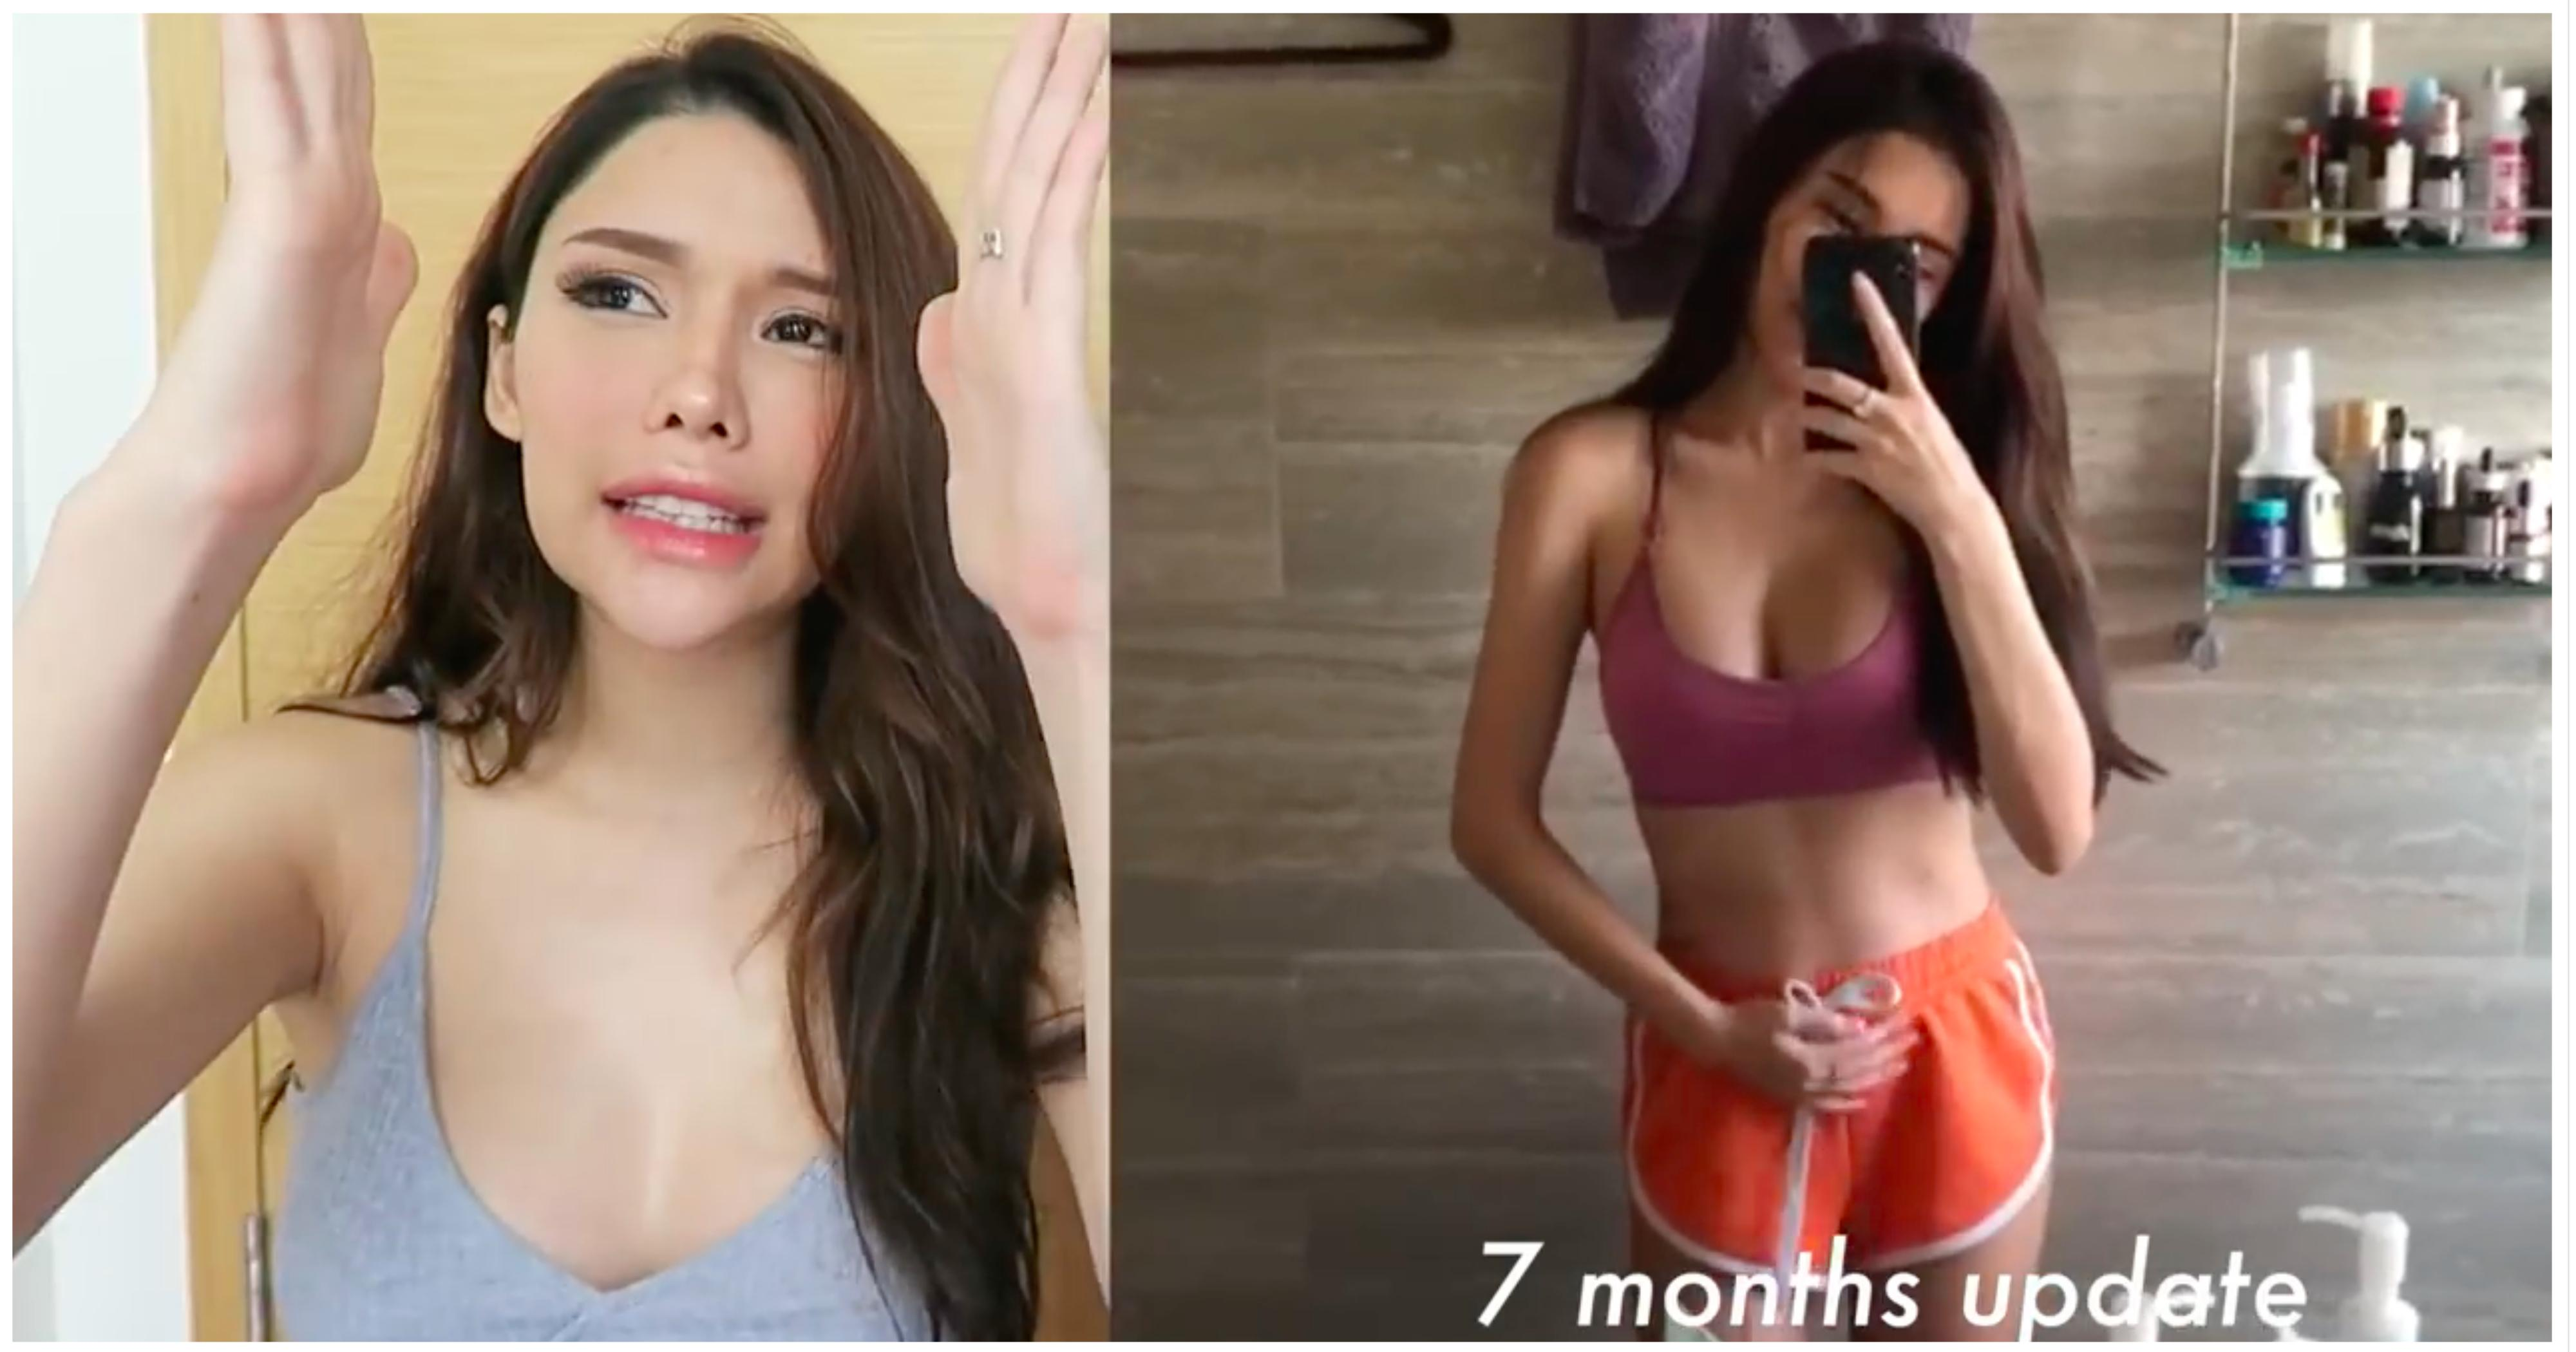 S Porean Dj Jade Rasif Reveals She Is More Than 7 Months Pregnant